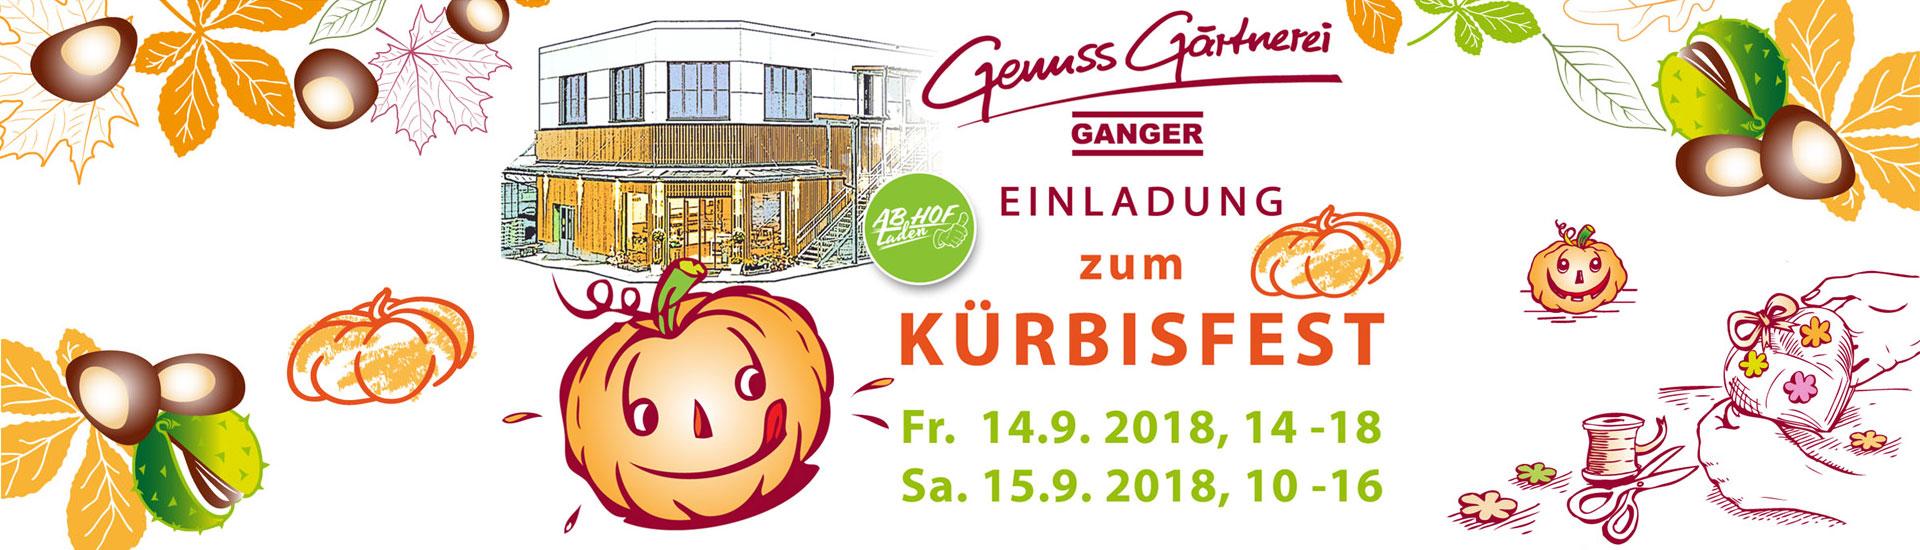 Gärtnerei Ganger | Kürbisfest 2018